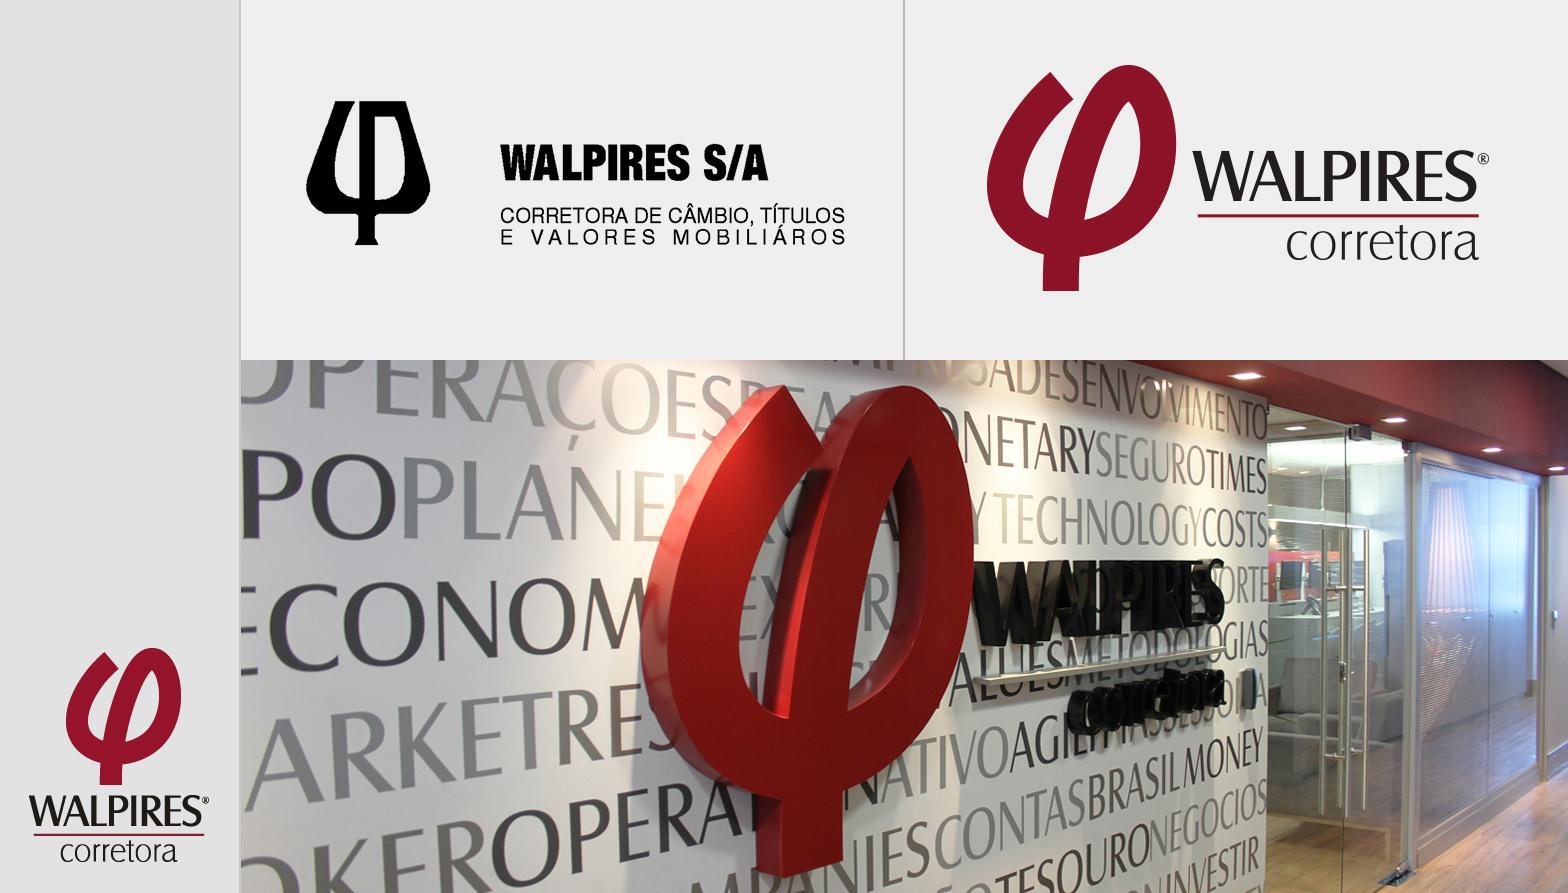 walpires logo